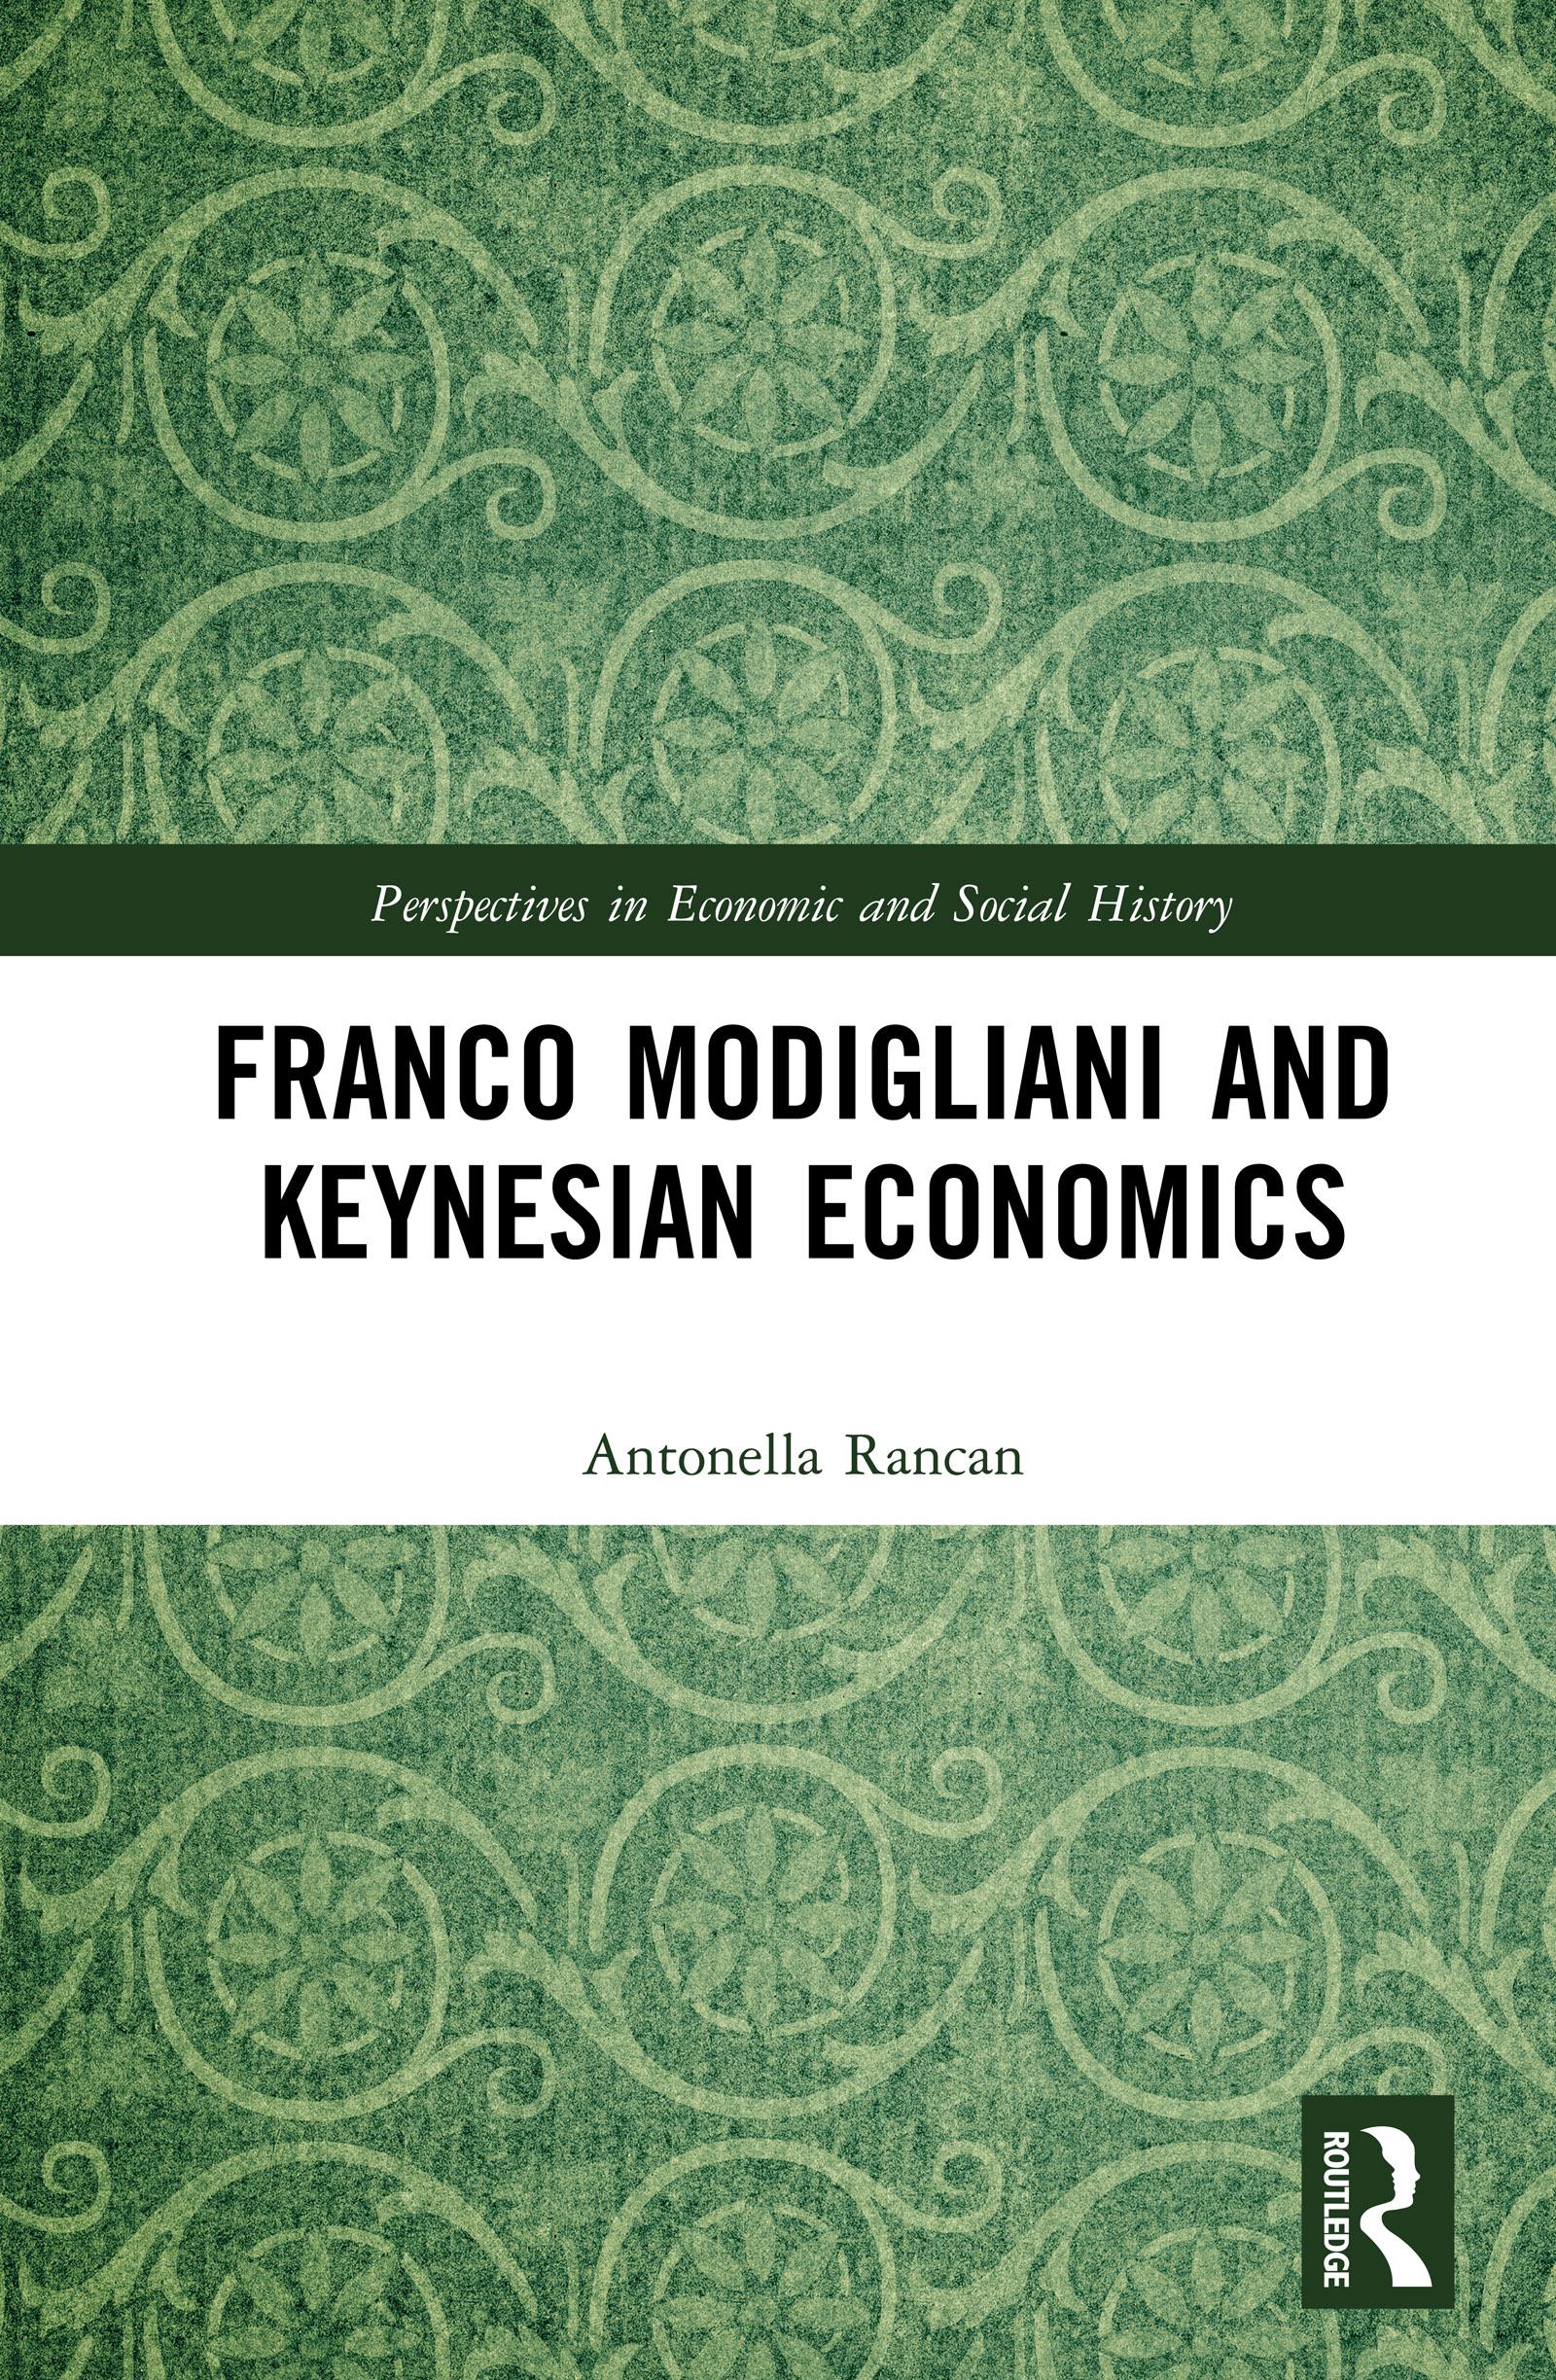 Franco Modigliani and Keynesian Economics